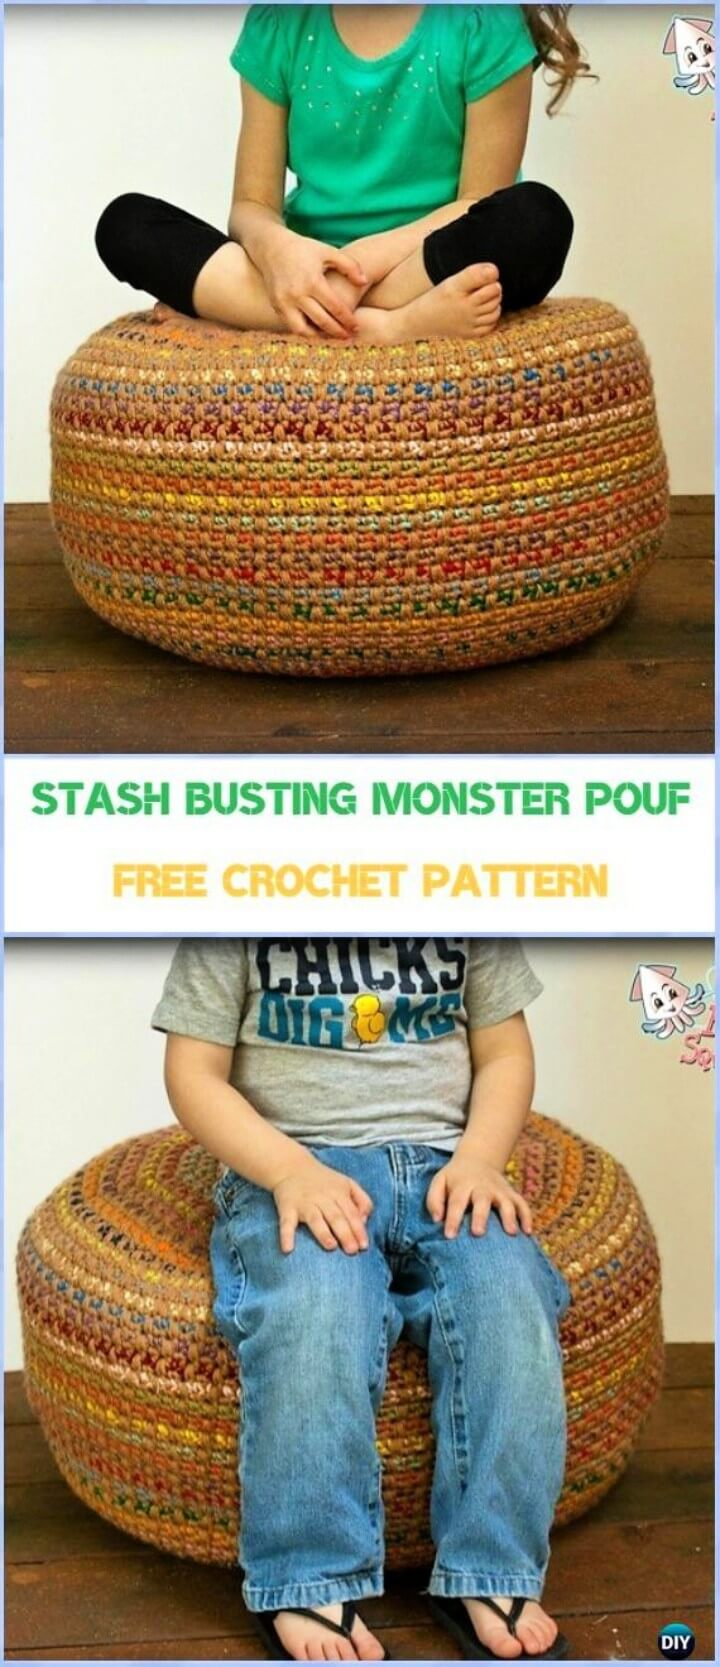 Stash Busting Monster Pouf